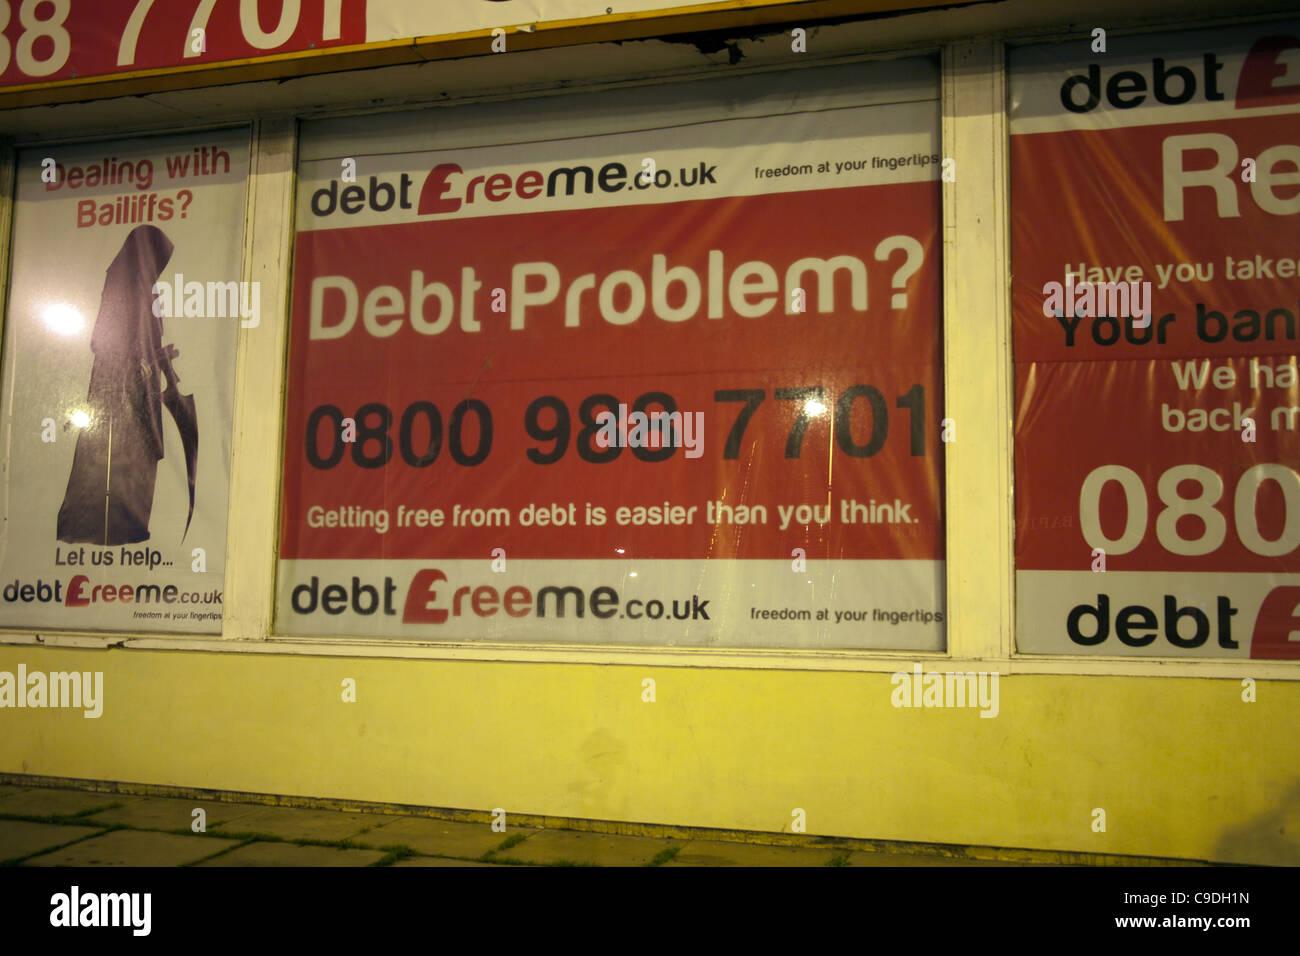 Debt Problem Poster & Shop Front _Uk debt free shop front in Southport, Merseyside, UK - Stock Image